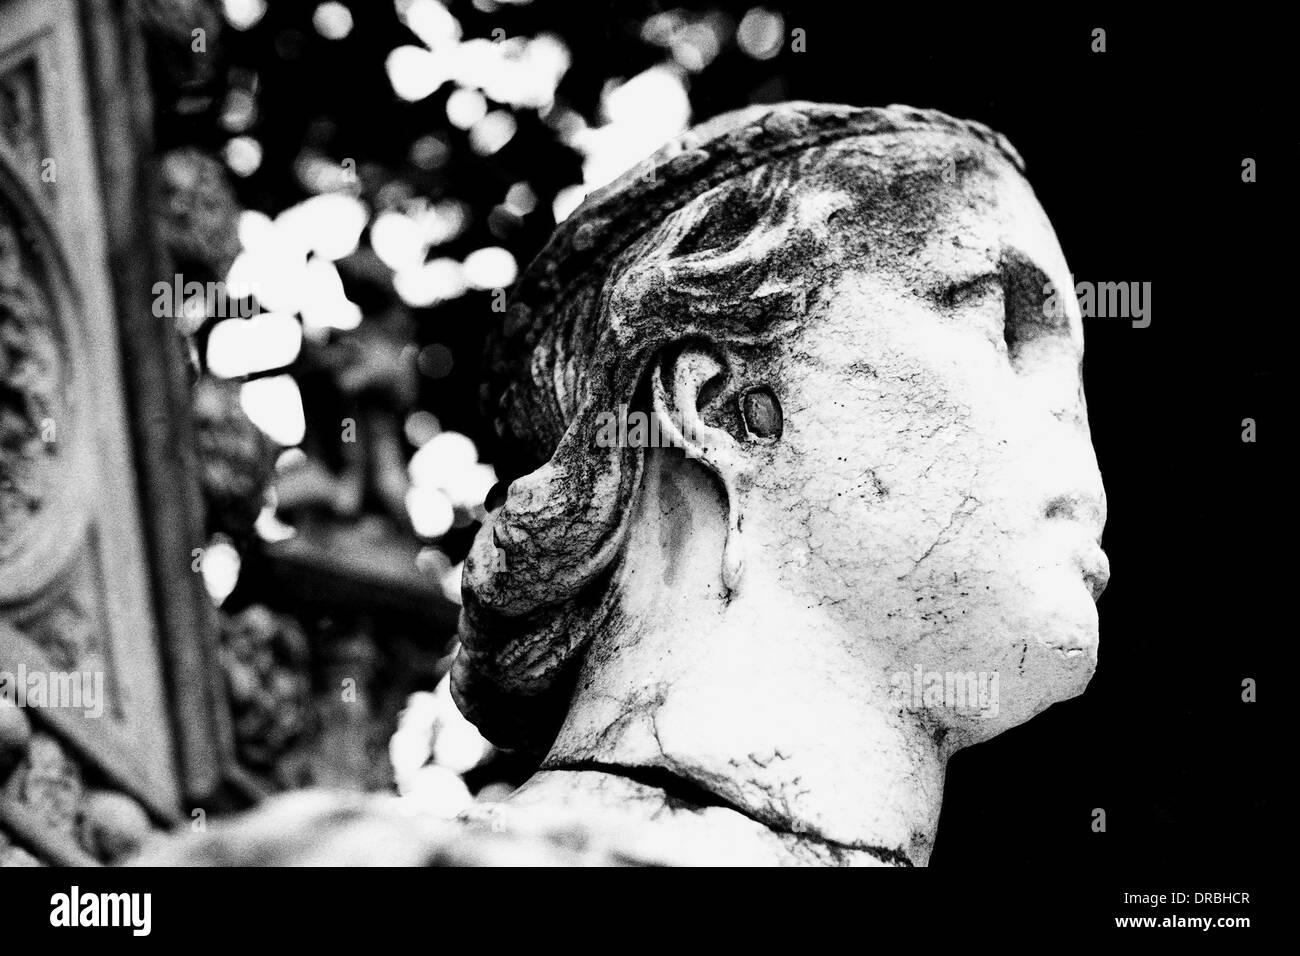 Broken nose of British royalty statue, Byculla Zoo, Mumbai, Maharashtra, India, 1976 - Stock Image